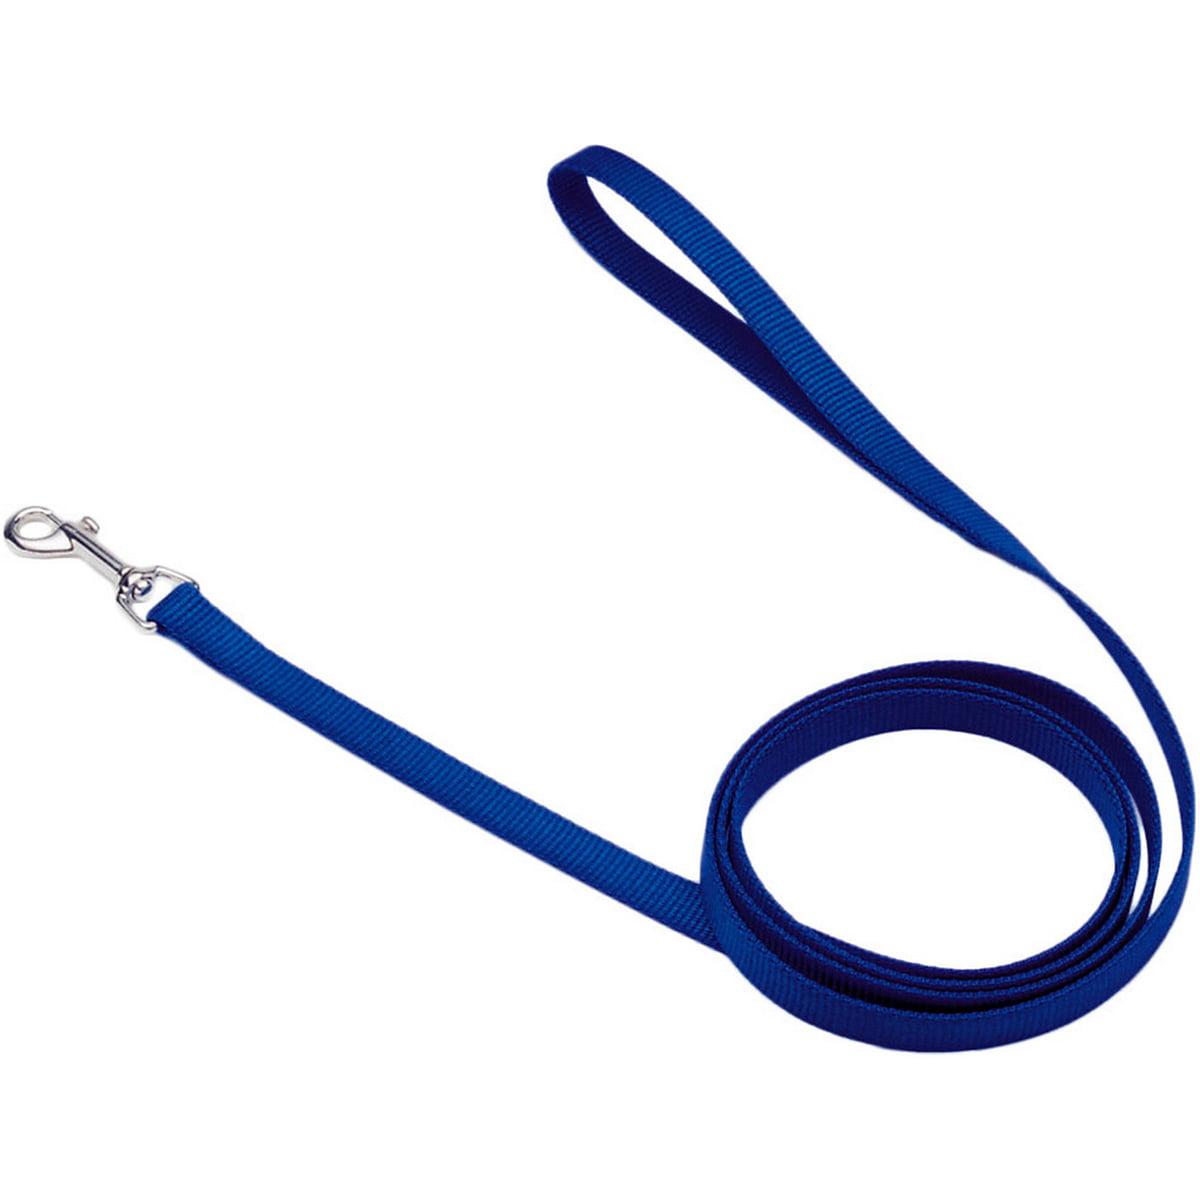 Coastal Pet Products Single-Ply Nylon Dog Leash